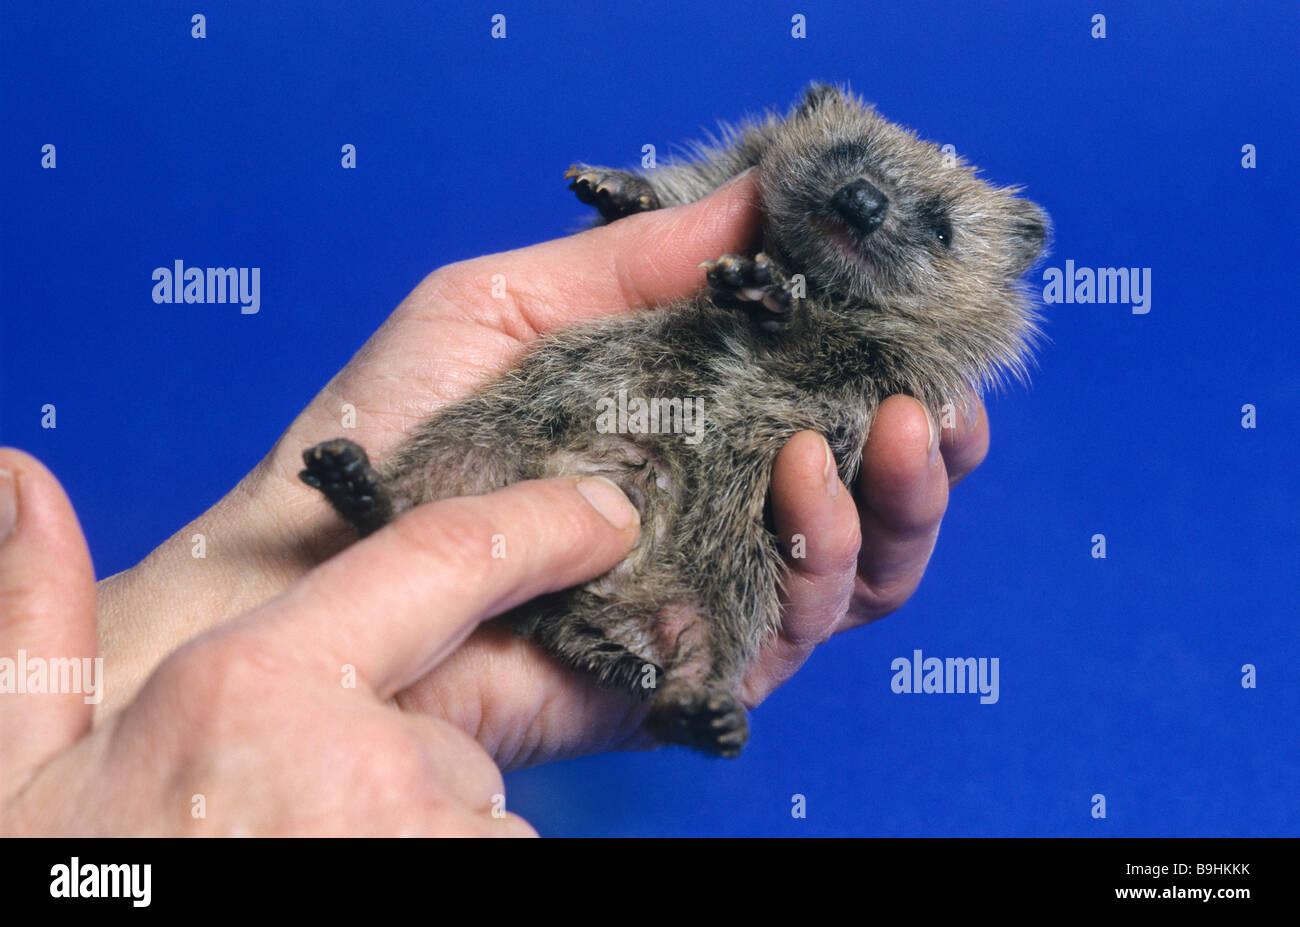 Hands examining a young West European Hedgehog (Erinaceus europaeus) - Stock Image